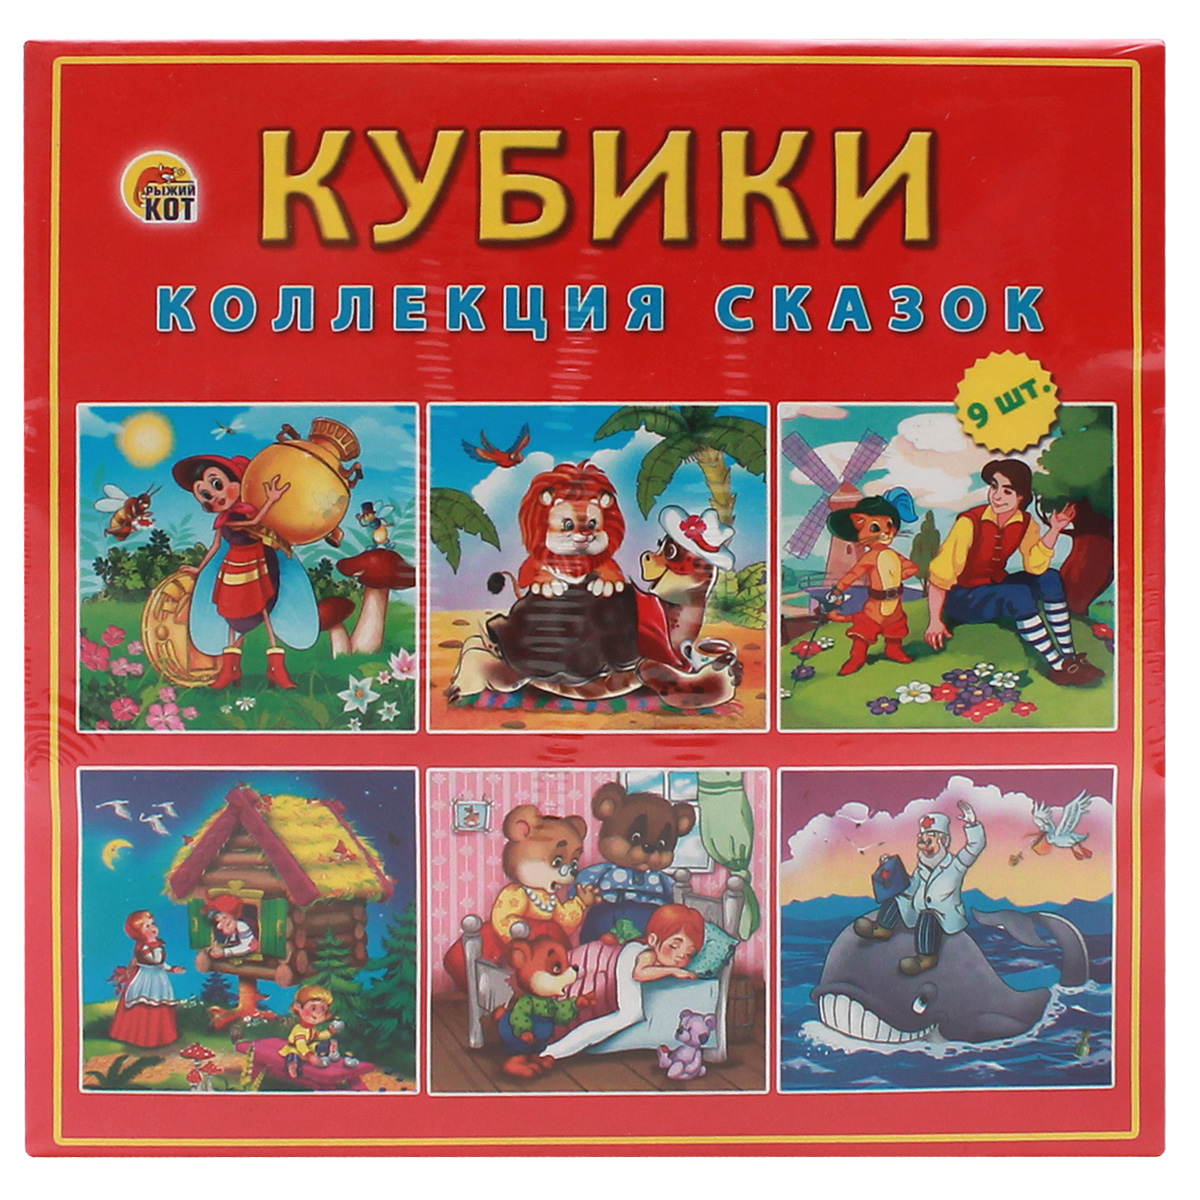 Рыжий Кот Кубики Коллекция сказок